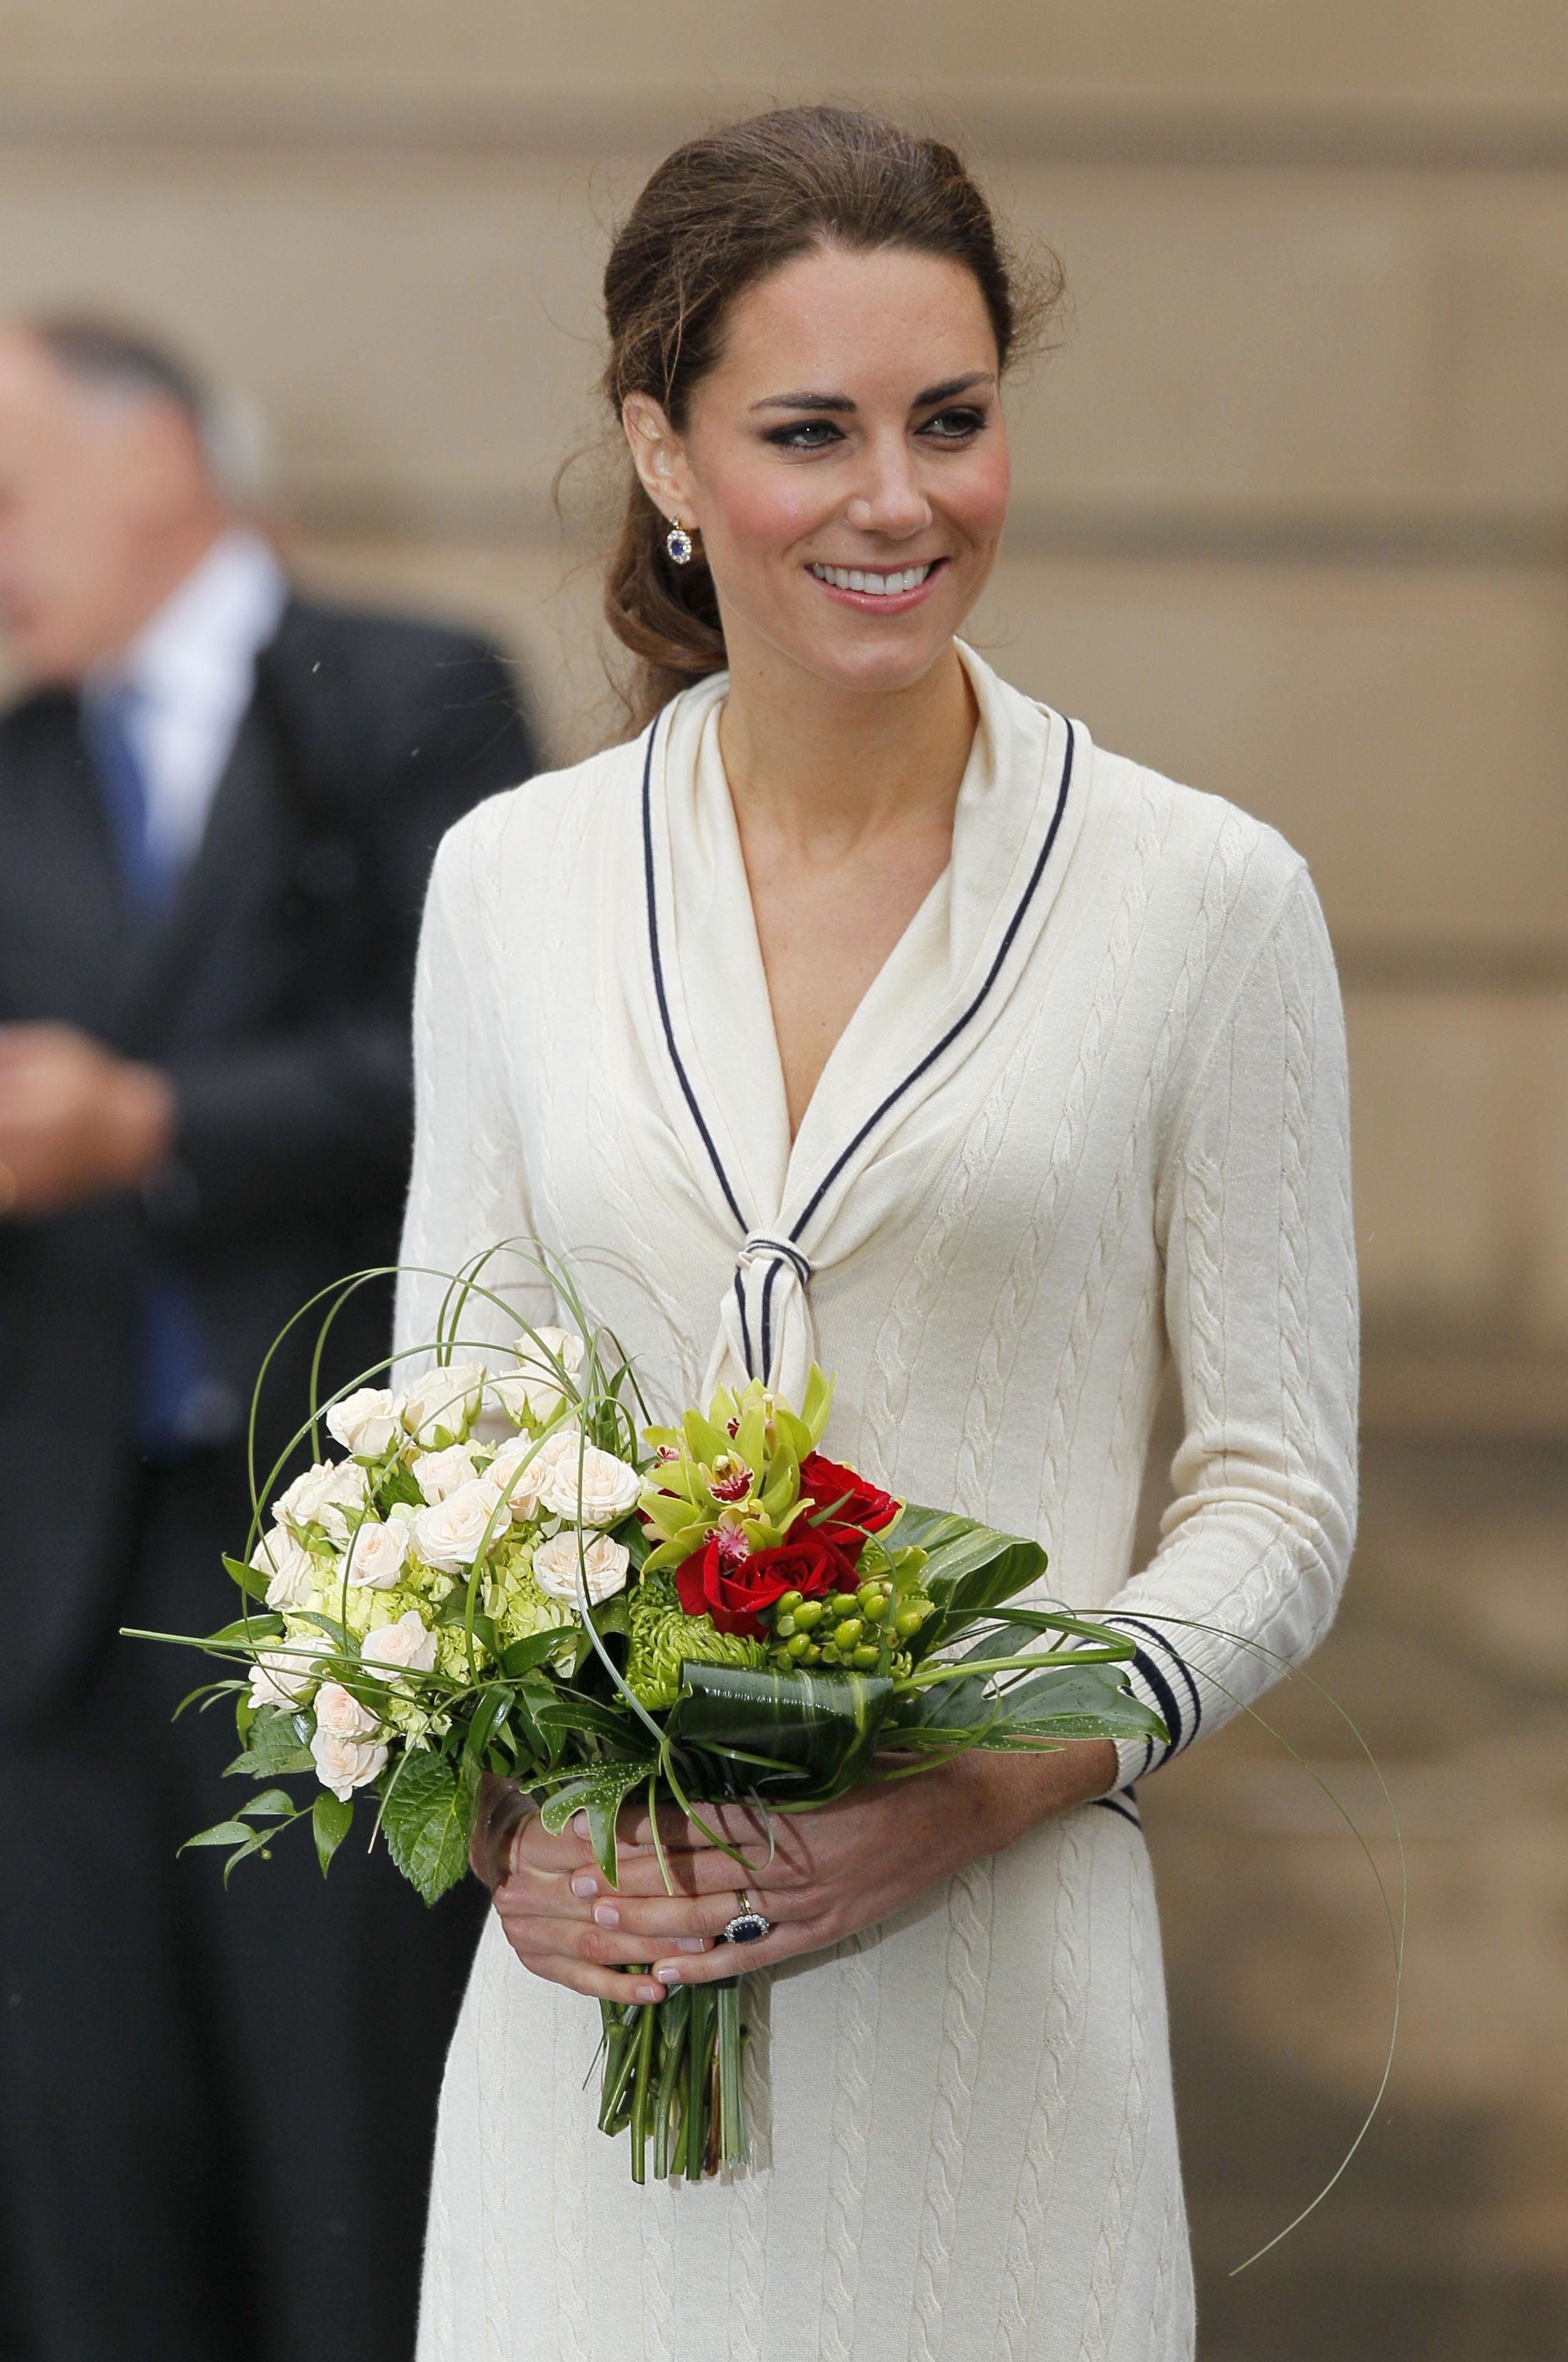 the Duchess of Cambridge's McQueen sweater dress.